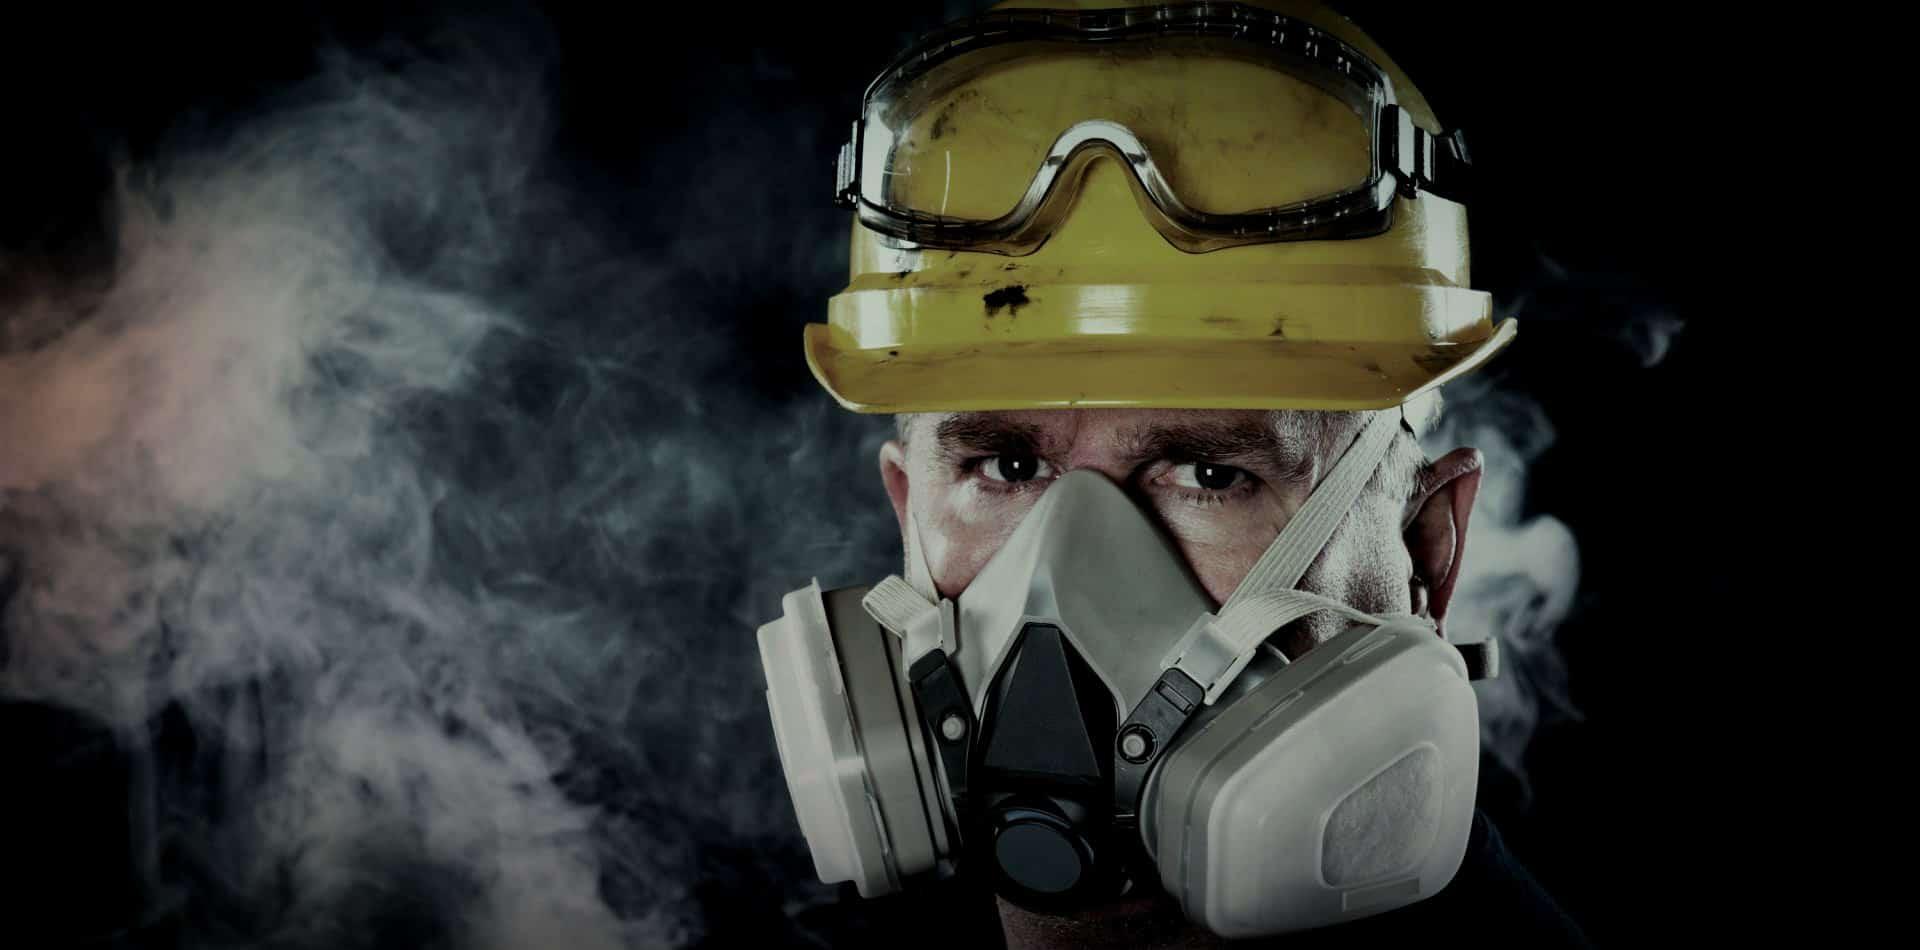 Remove Non-friable asbestos Dandenong @ DANDENONG | Dandenong | Victoria | Australia